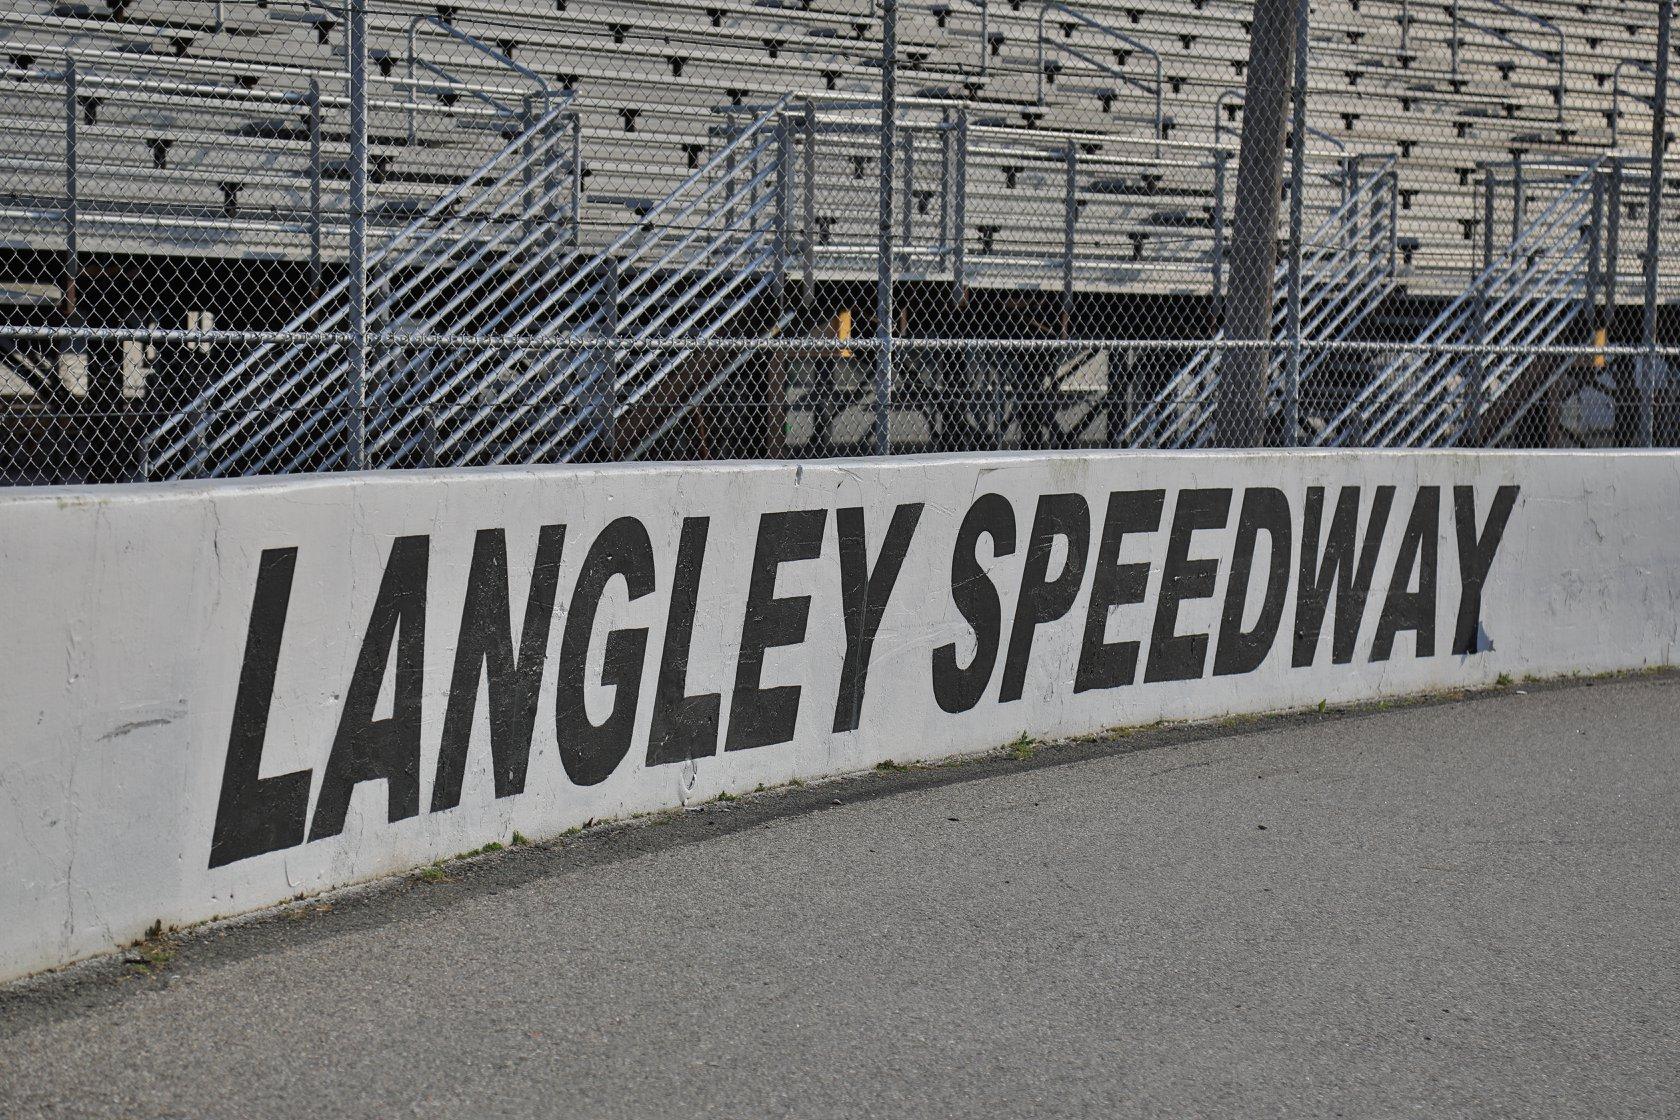 Langley Speedway